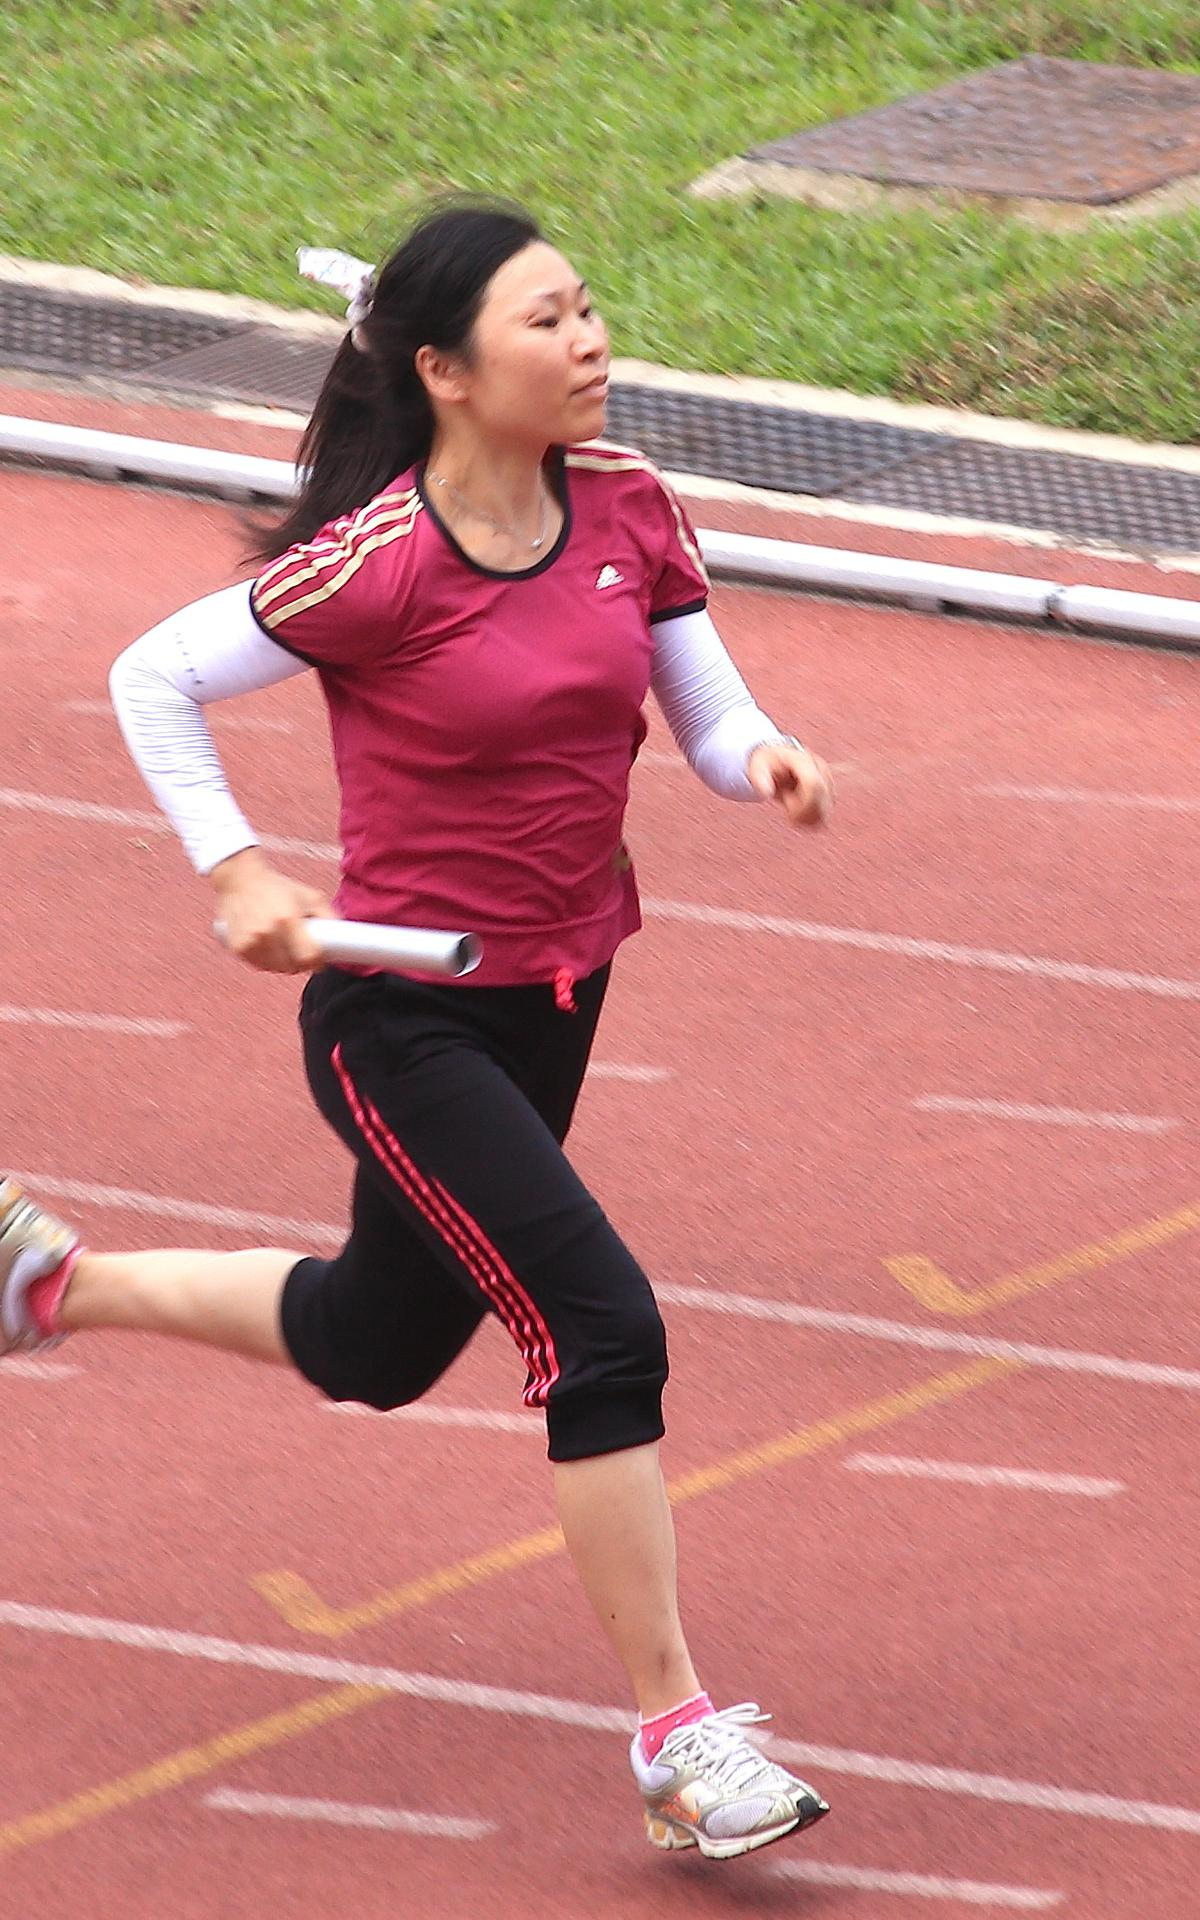 e0909-sport-09.jpg